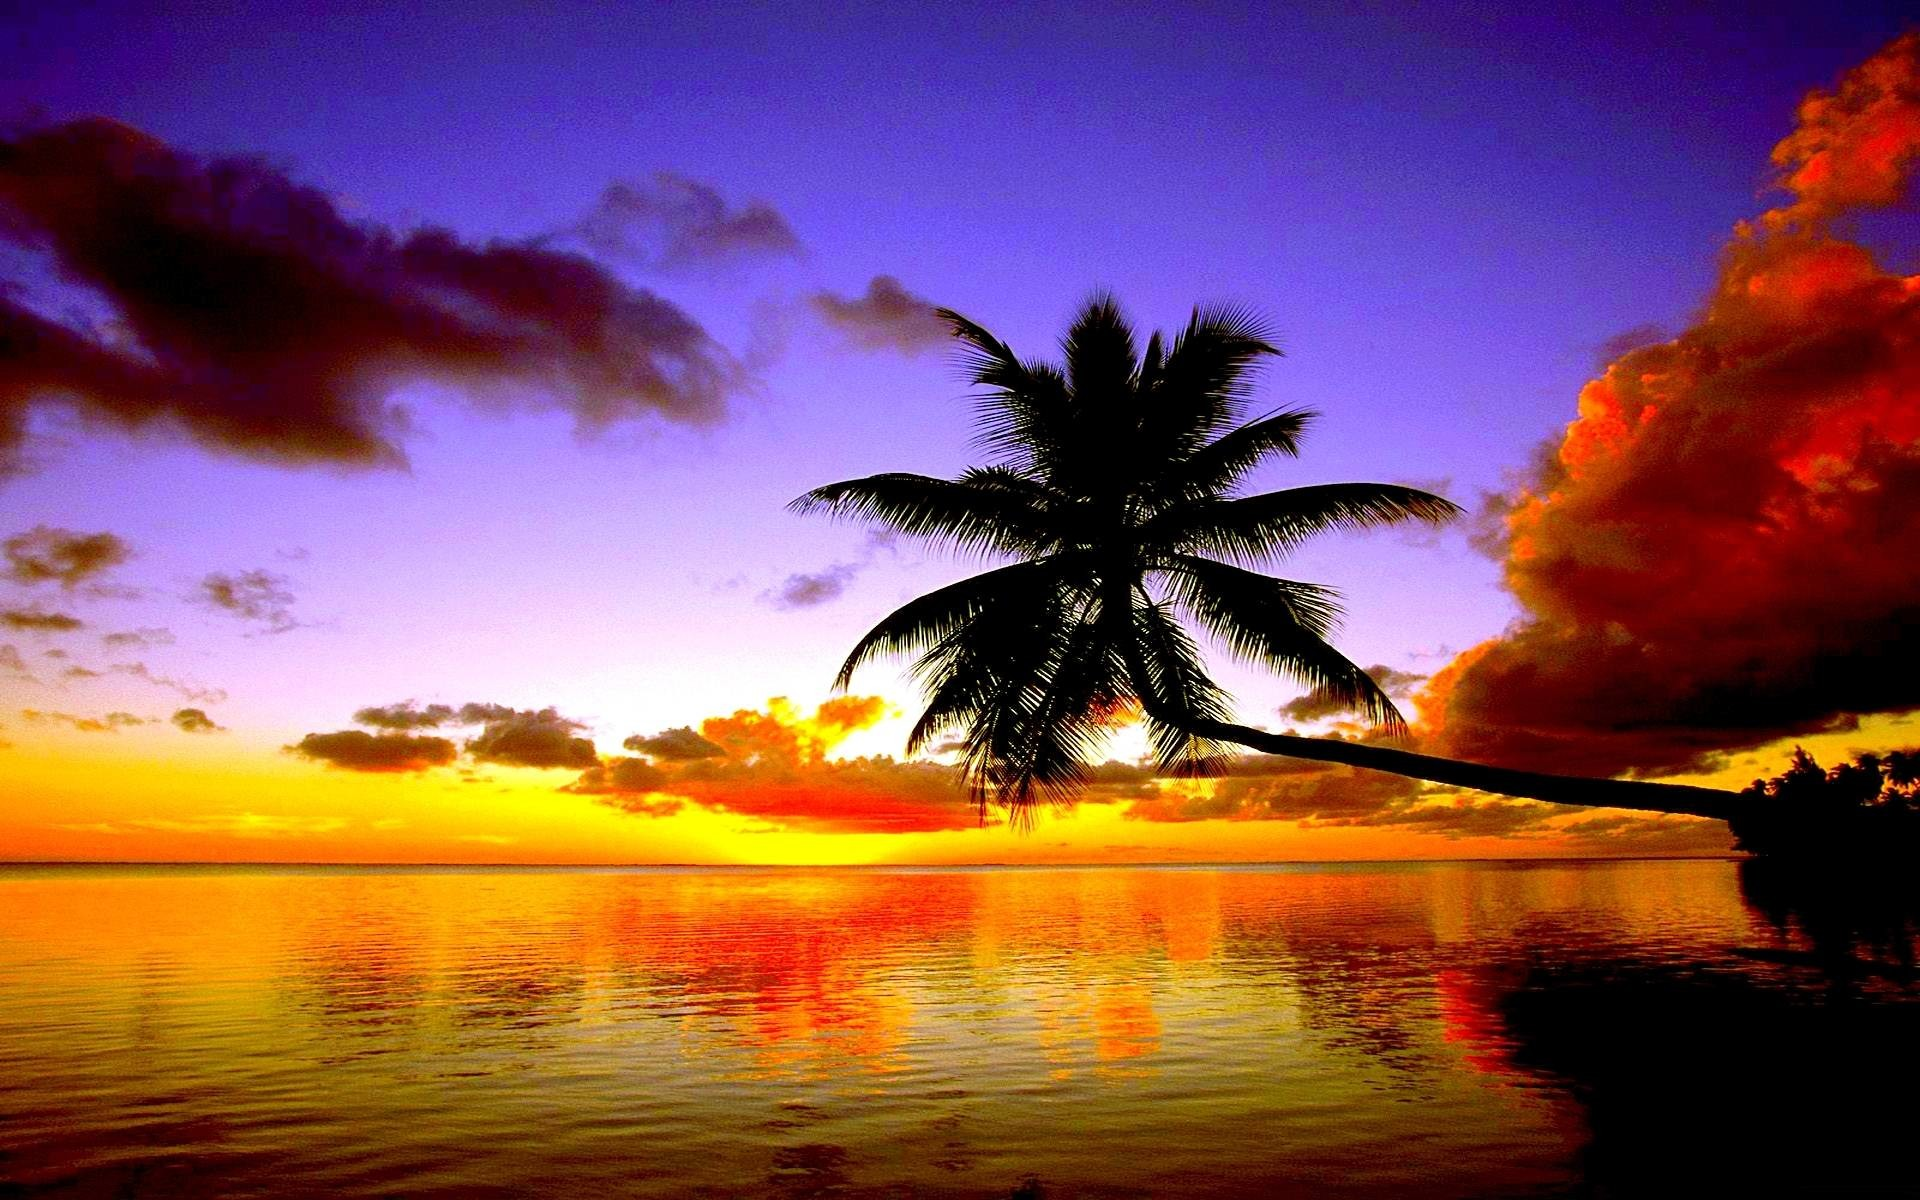 Beach hd wallpapers 1080p 68 images 1920x1200 beach sunset wallpaper 1080p as wallpaper hd voltagebd Choice Image